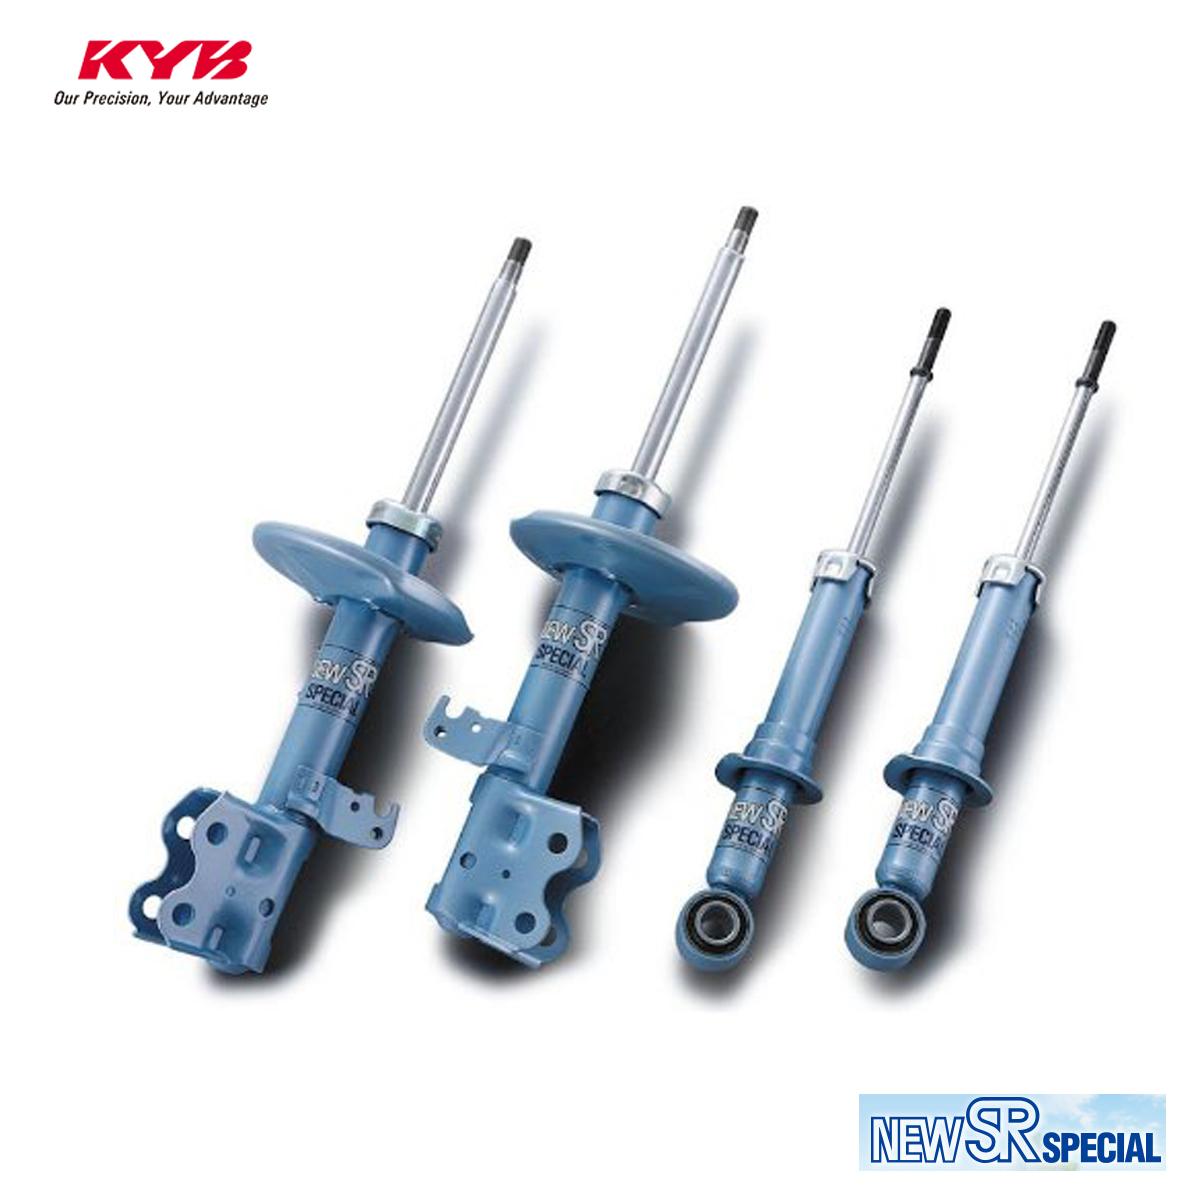 KYB カヤバ CRV RM4 ショックアブソーバー 1台分 NEW SR SPECIAL NS-54789200 配送先条件有り